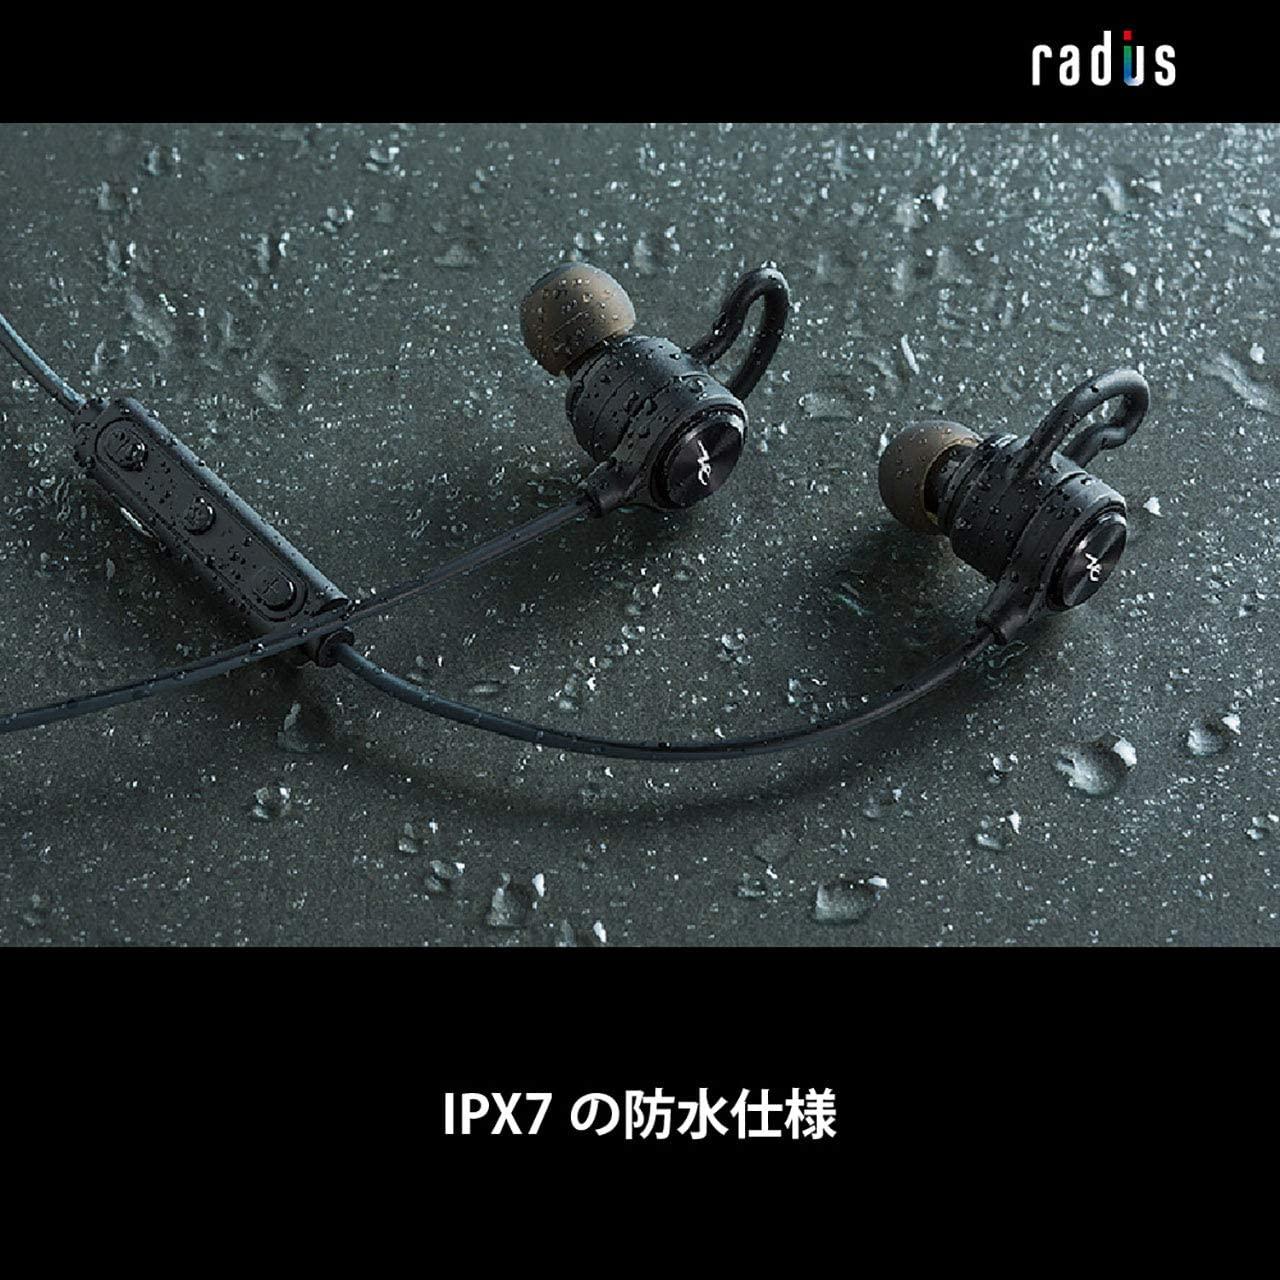 HP-G100BT 重低音 水洗いOK 防水Bluetooth イヤホン